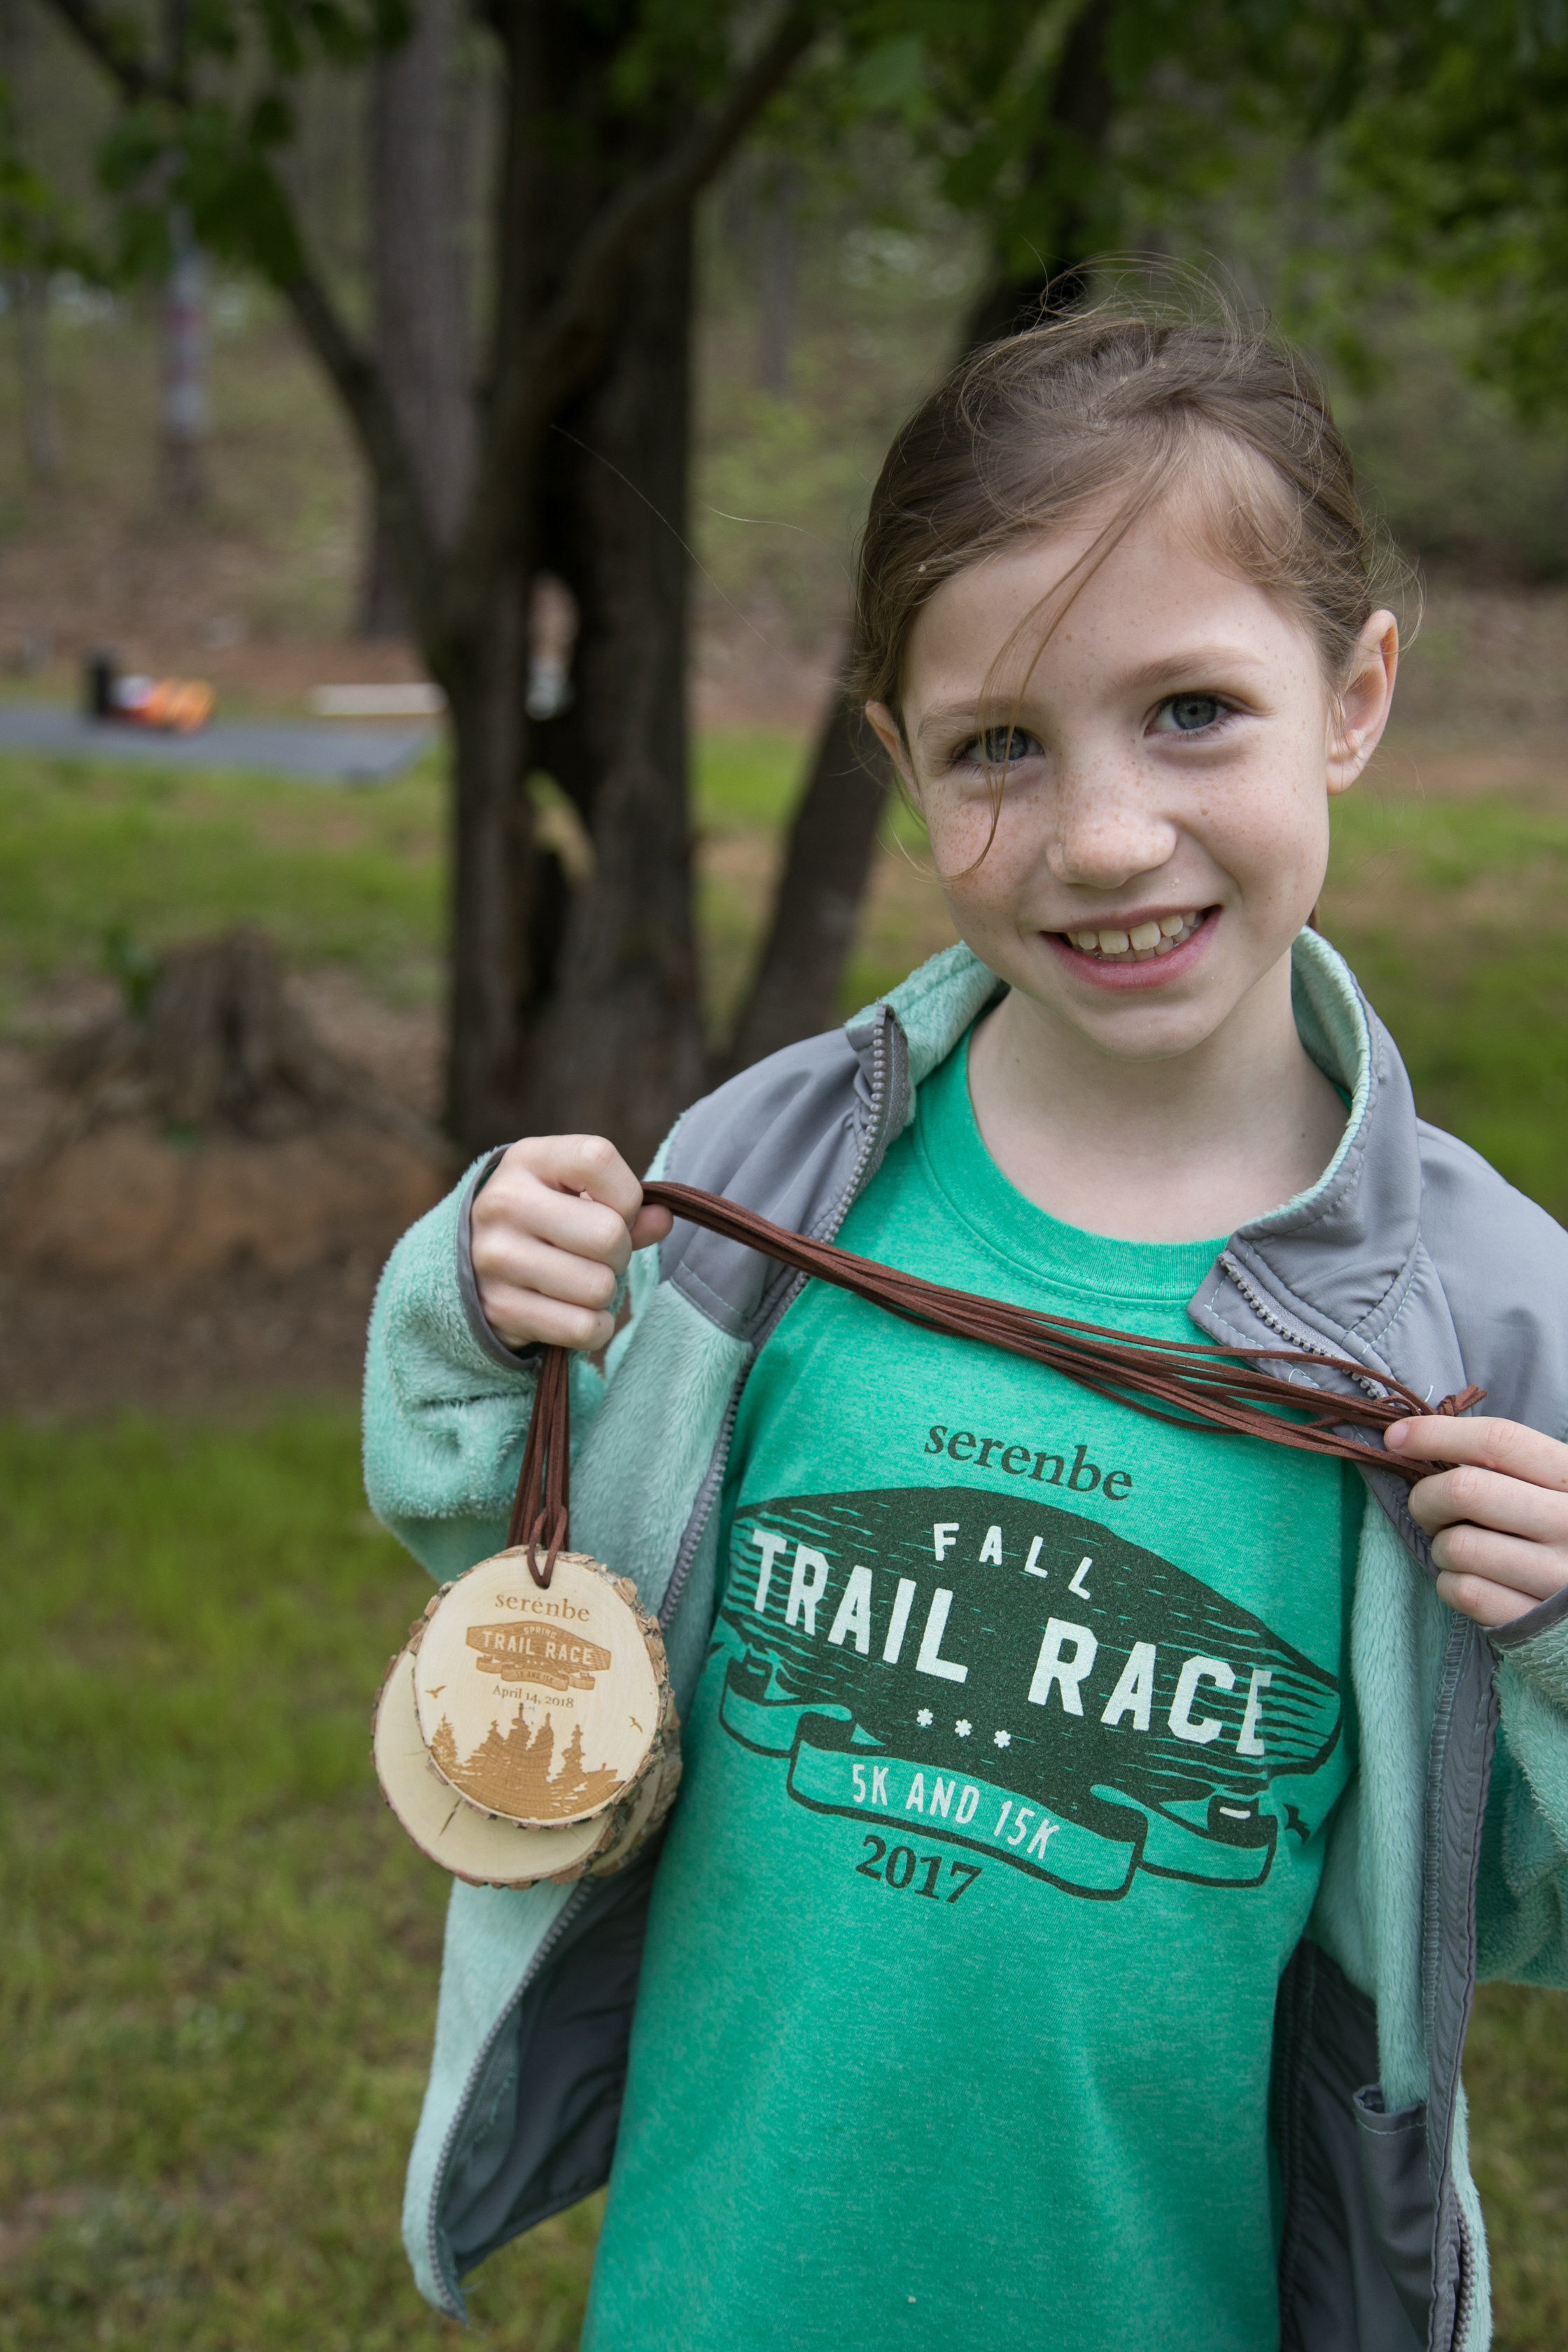 TR.Spring18.Medal.jpg